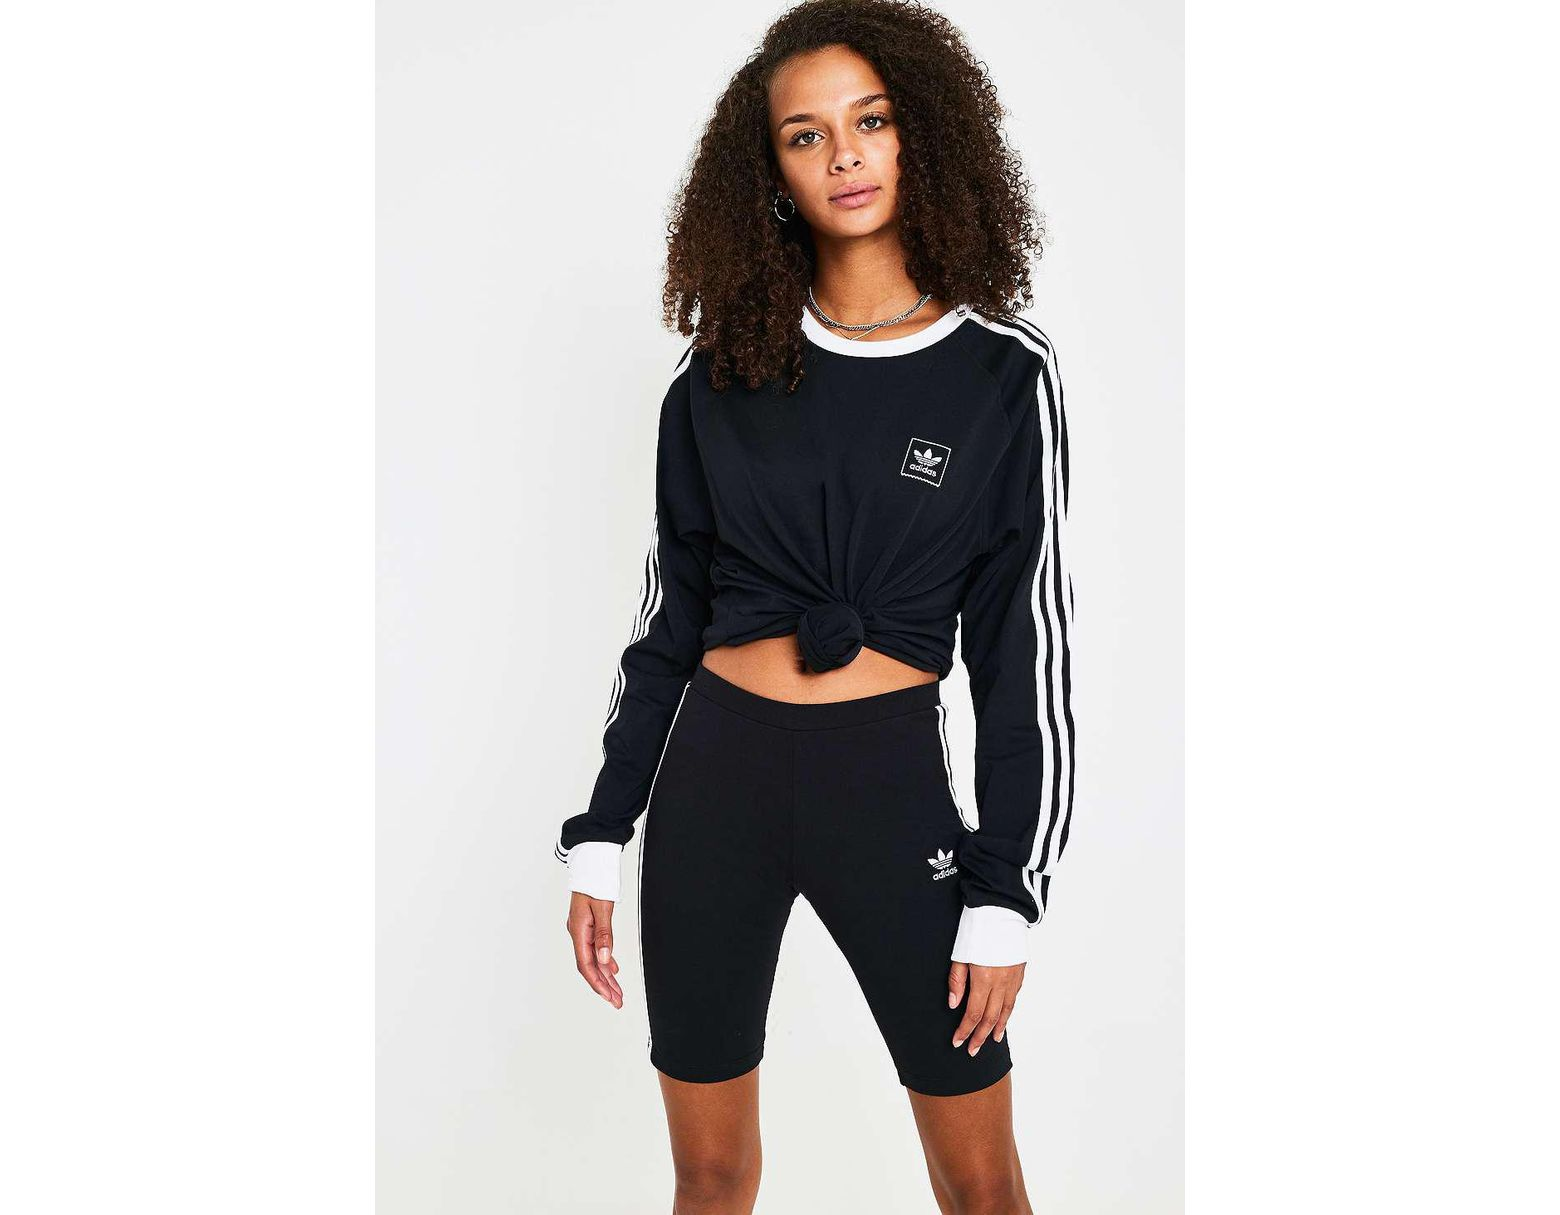 851074b9 Black Cycling Shorts - Womens Uk 8